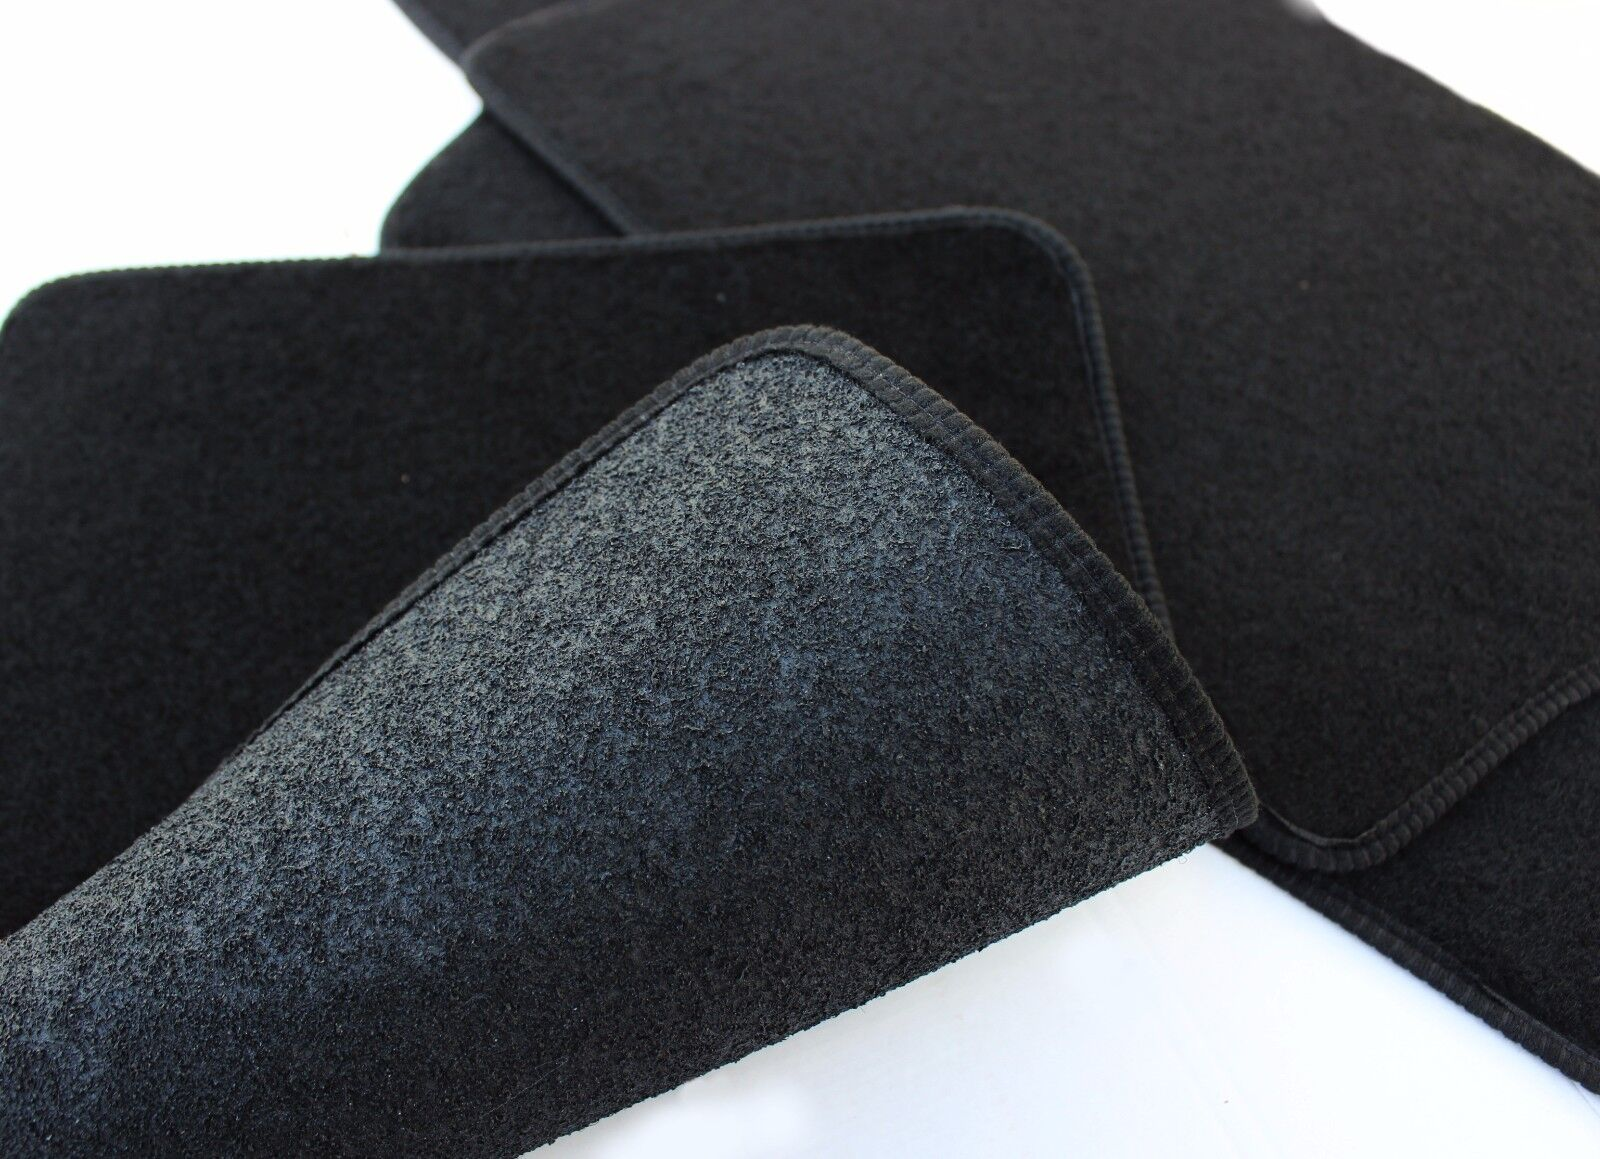 fu matten automatten velours f r opel meriva a 2003 2010 4tlg schwarz ebay. Black Bedroom Furniture Sets. Home Design Ideas